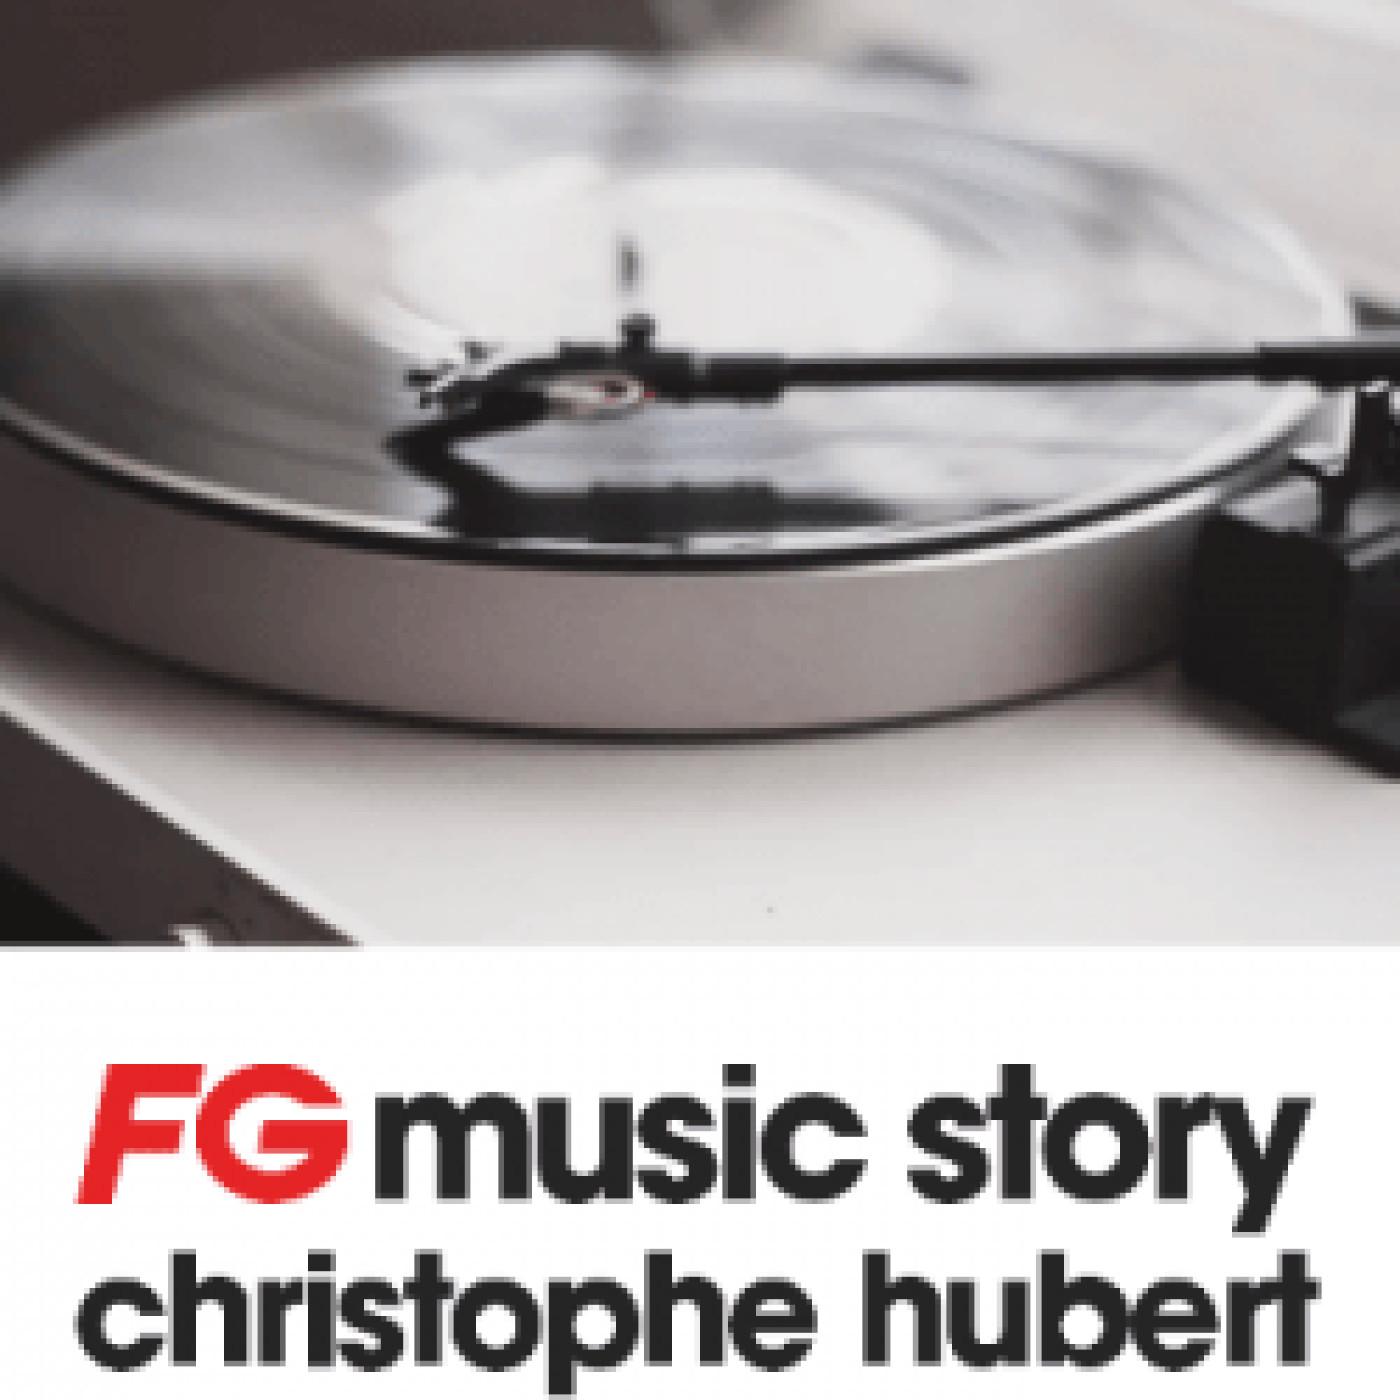 FG MUSIC STORY : MK